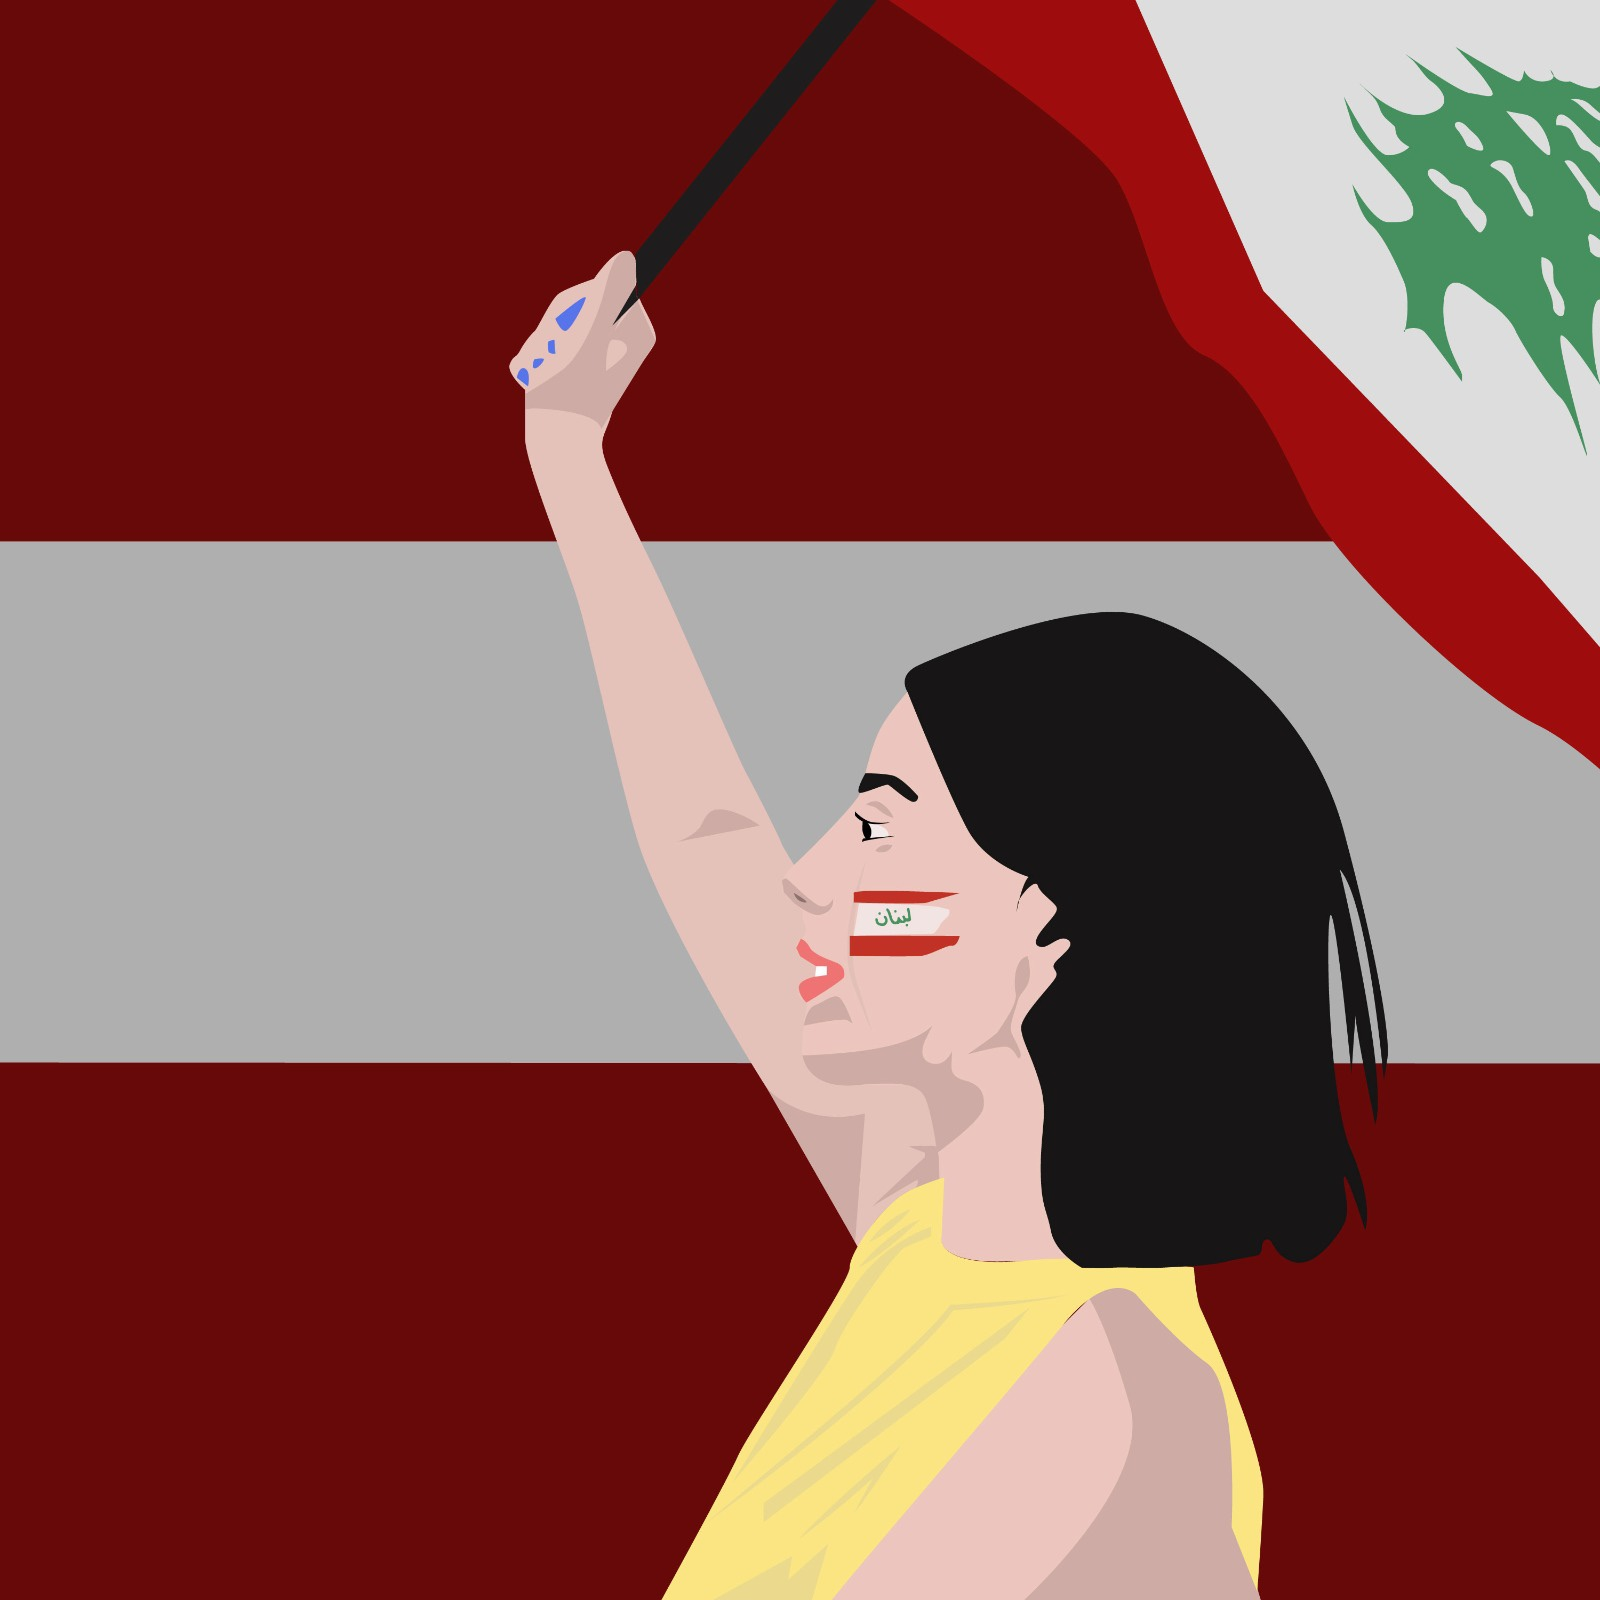 Syria illustration